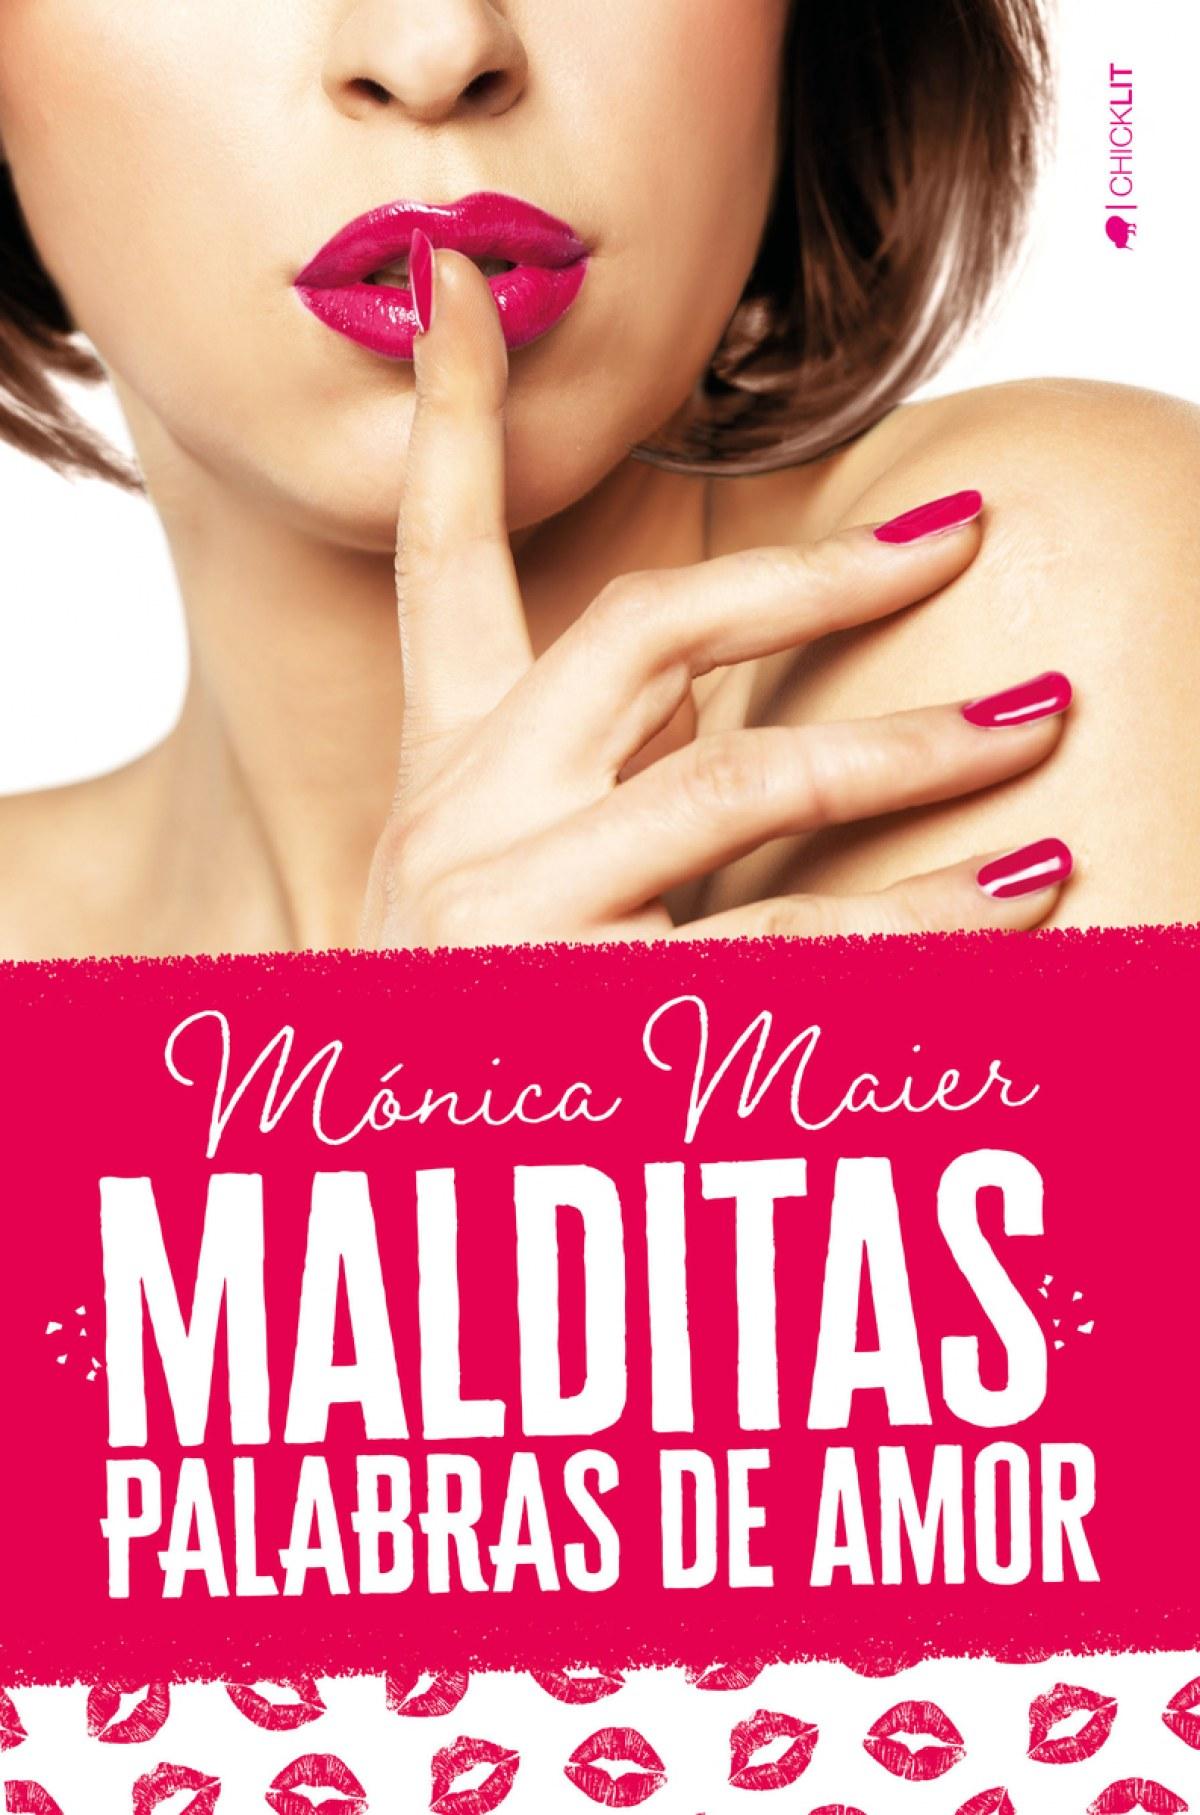 MALDITAS PALABRAS DE AMOR